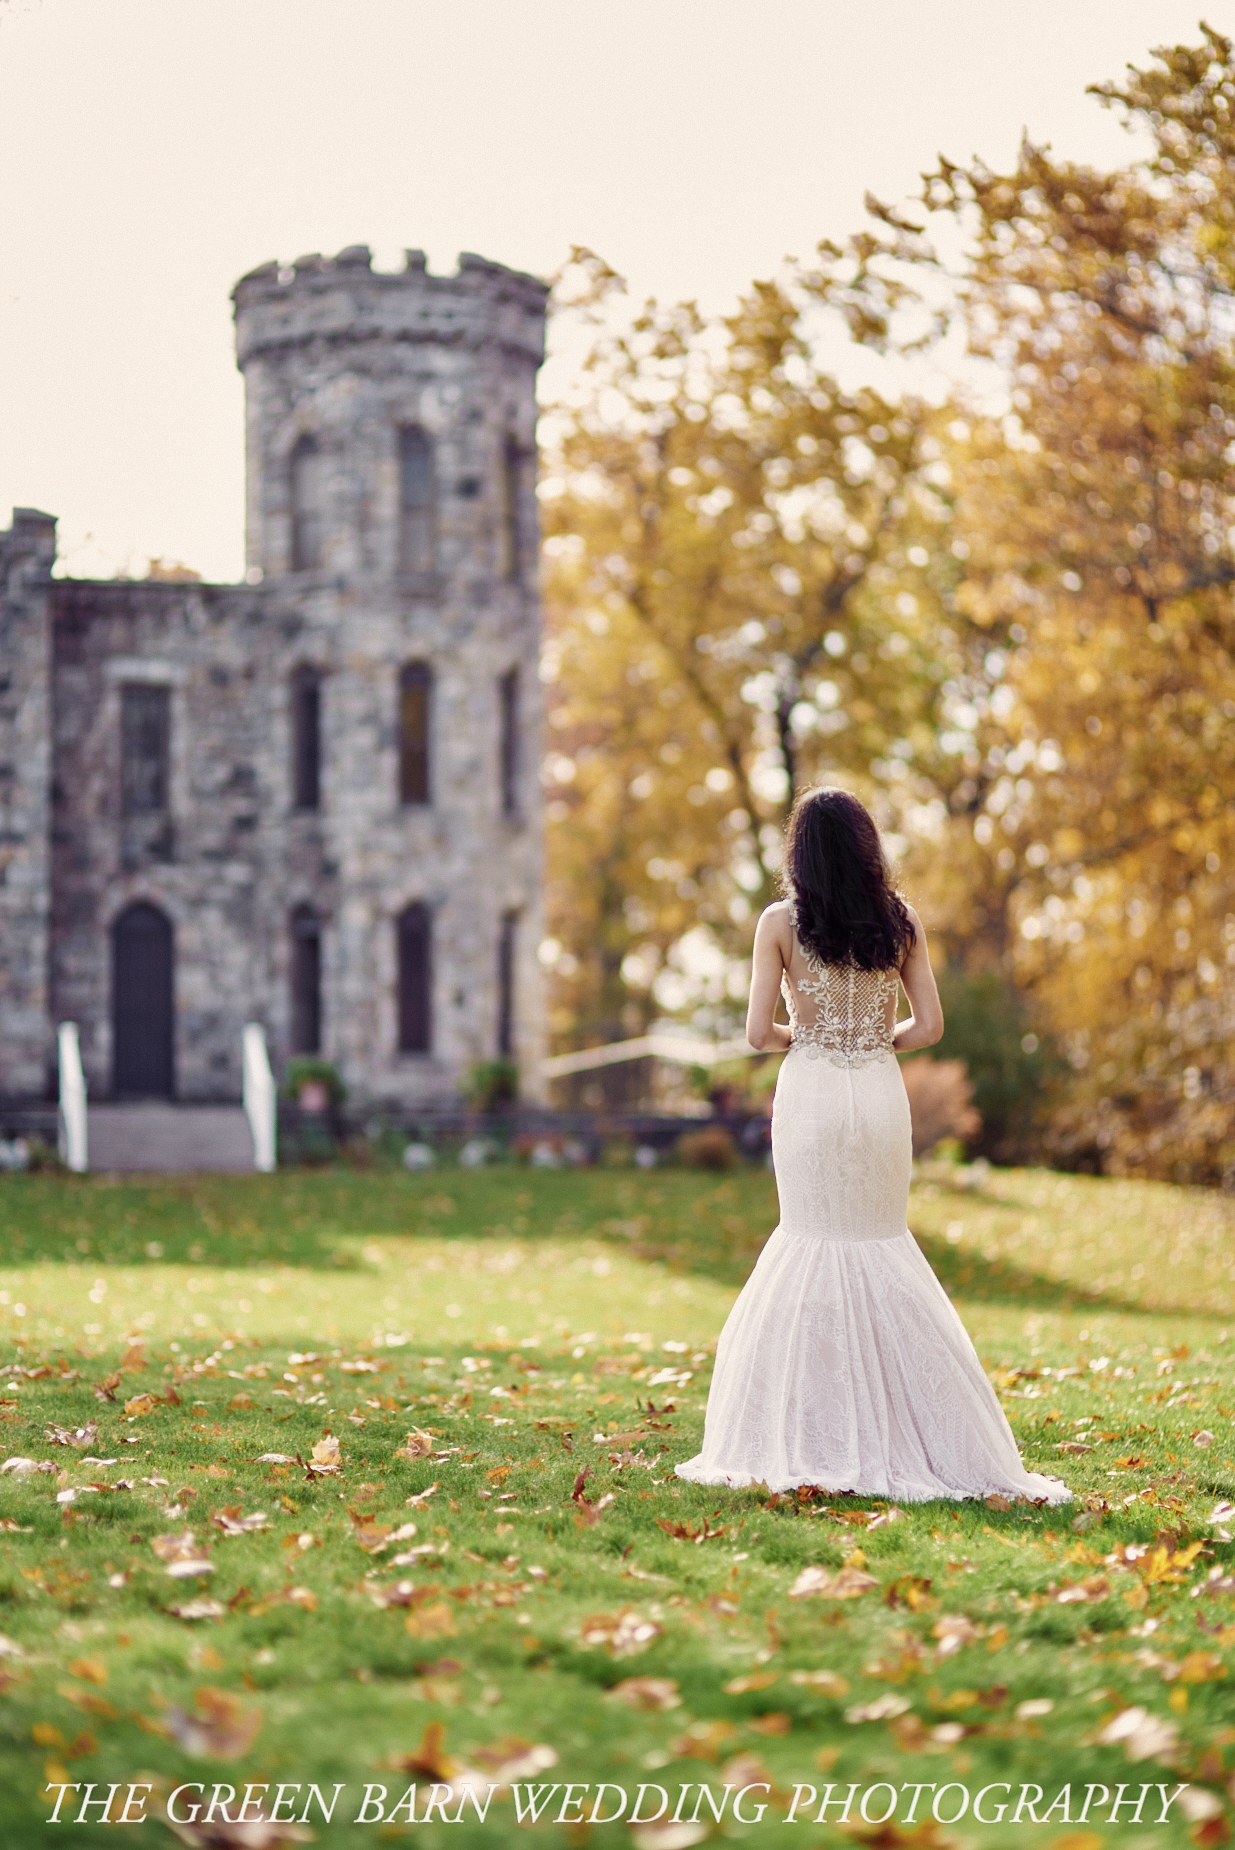 Autumn in New England Dream Wedding at Winnekenni Castle in Haverhill, MA